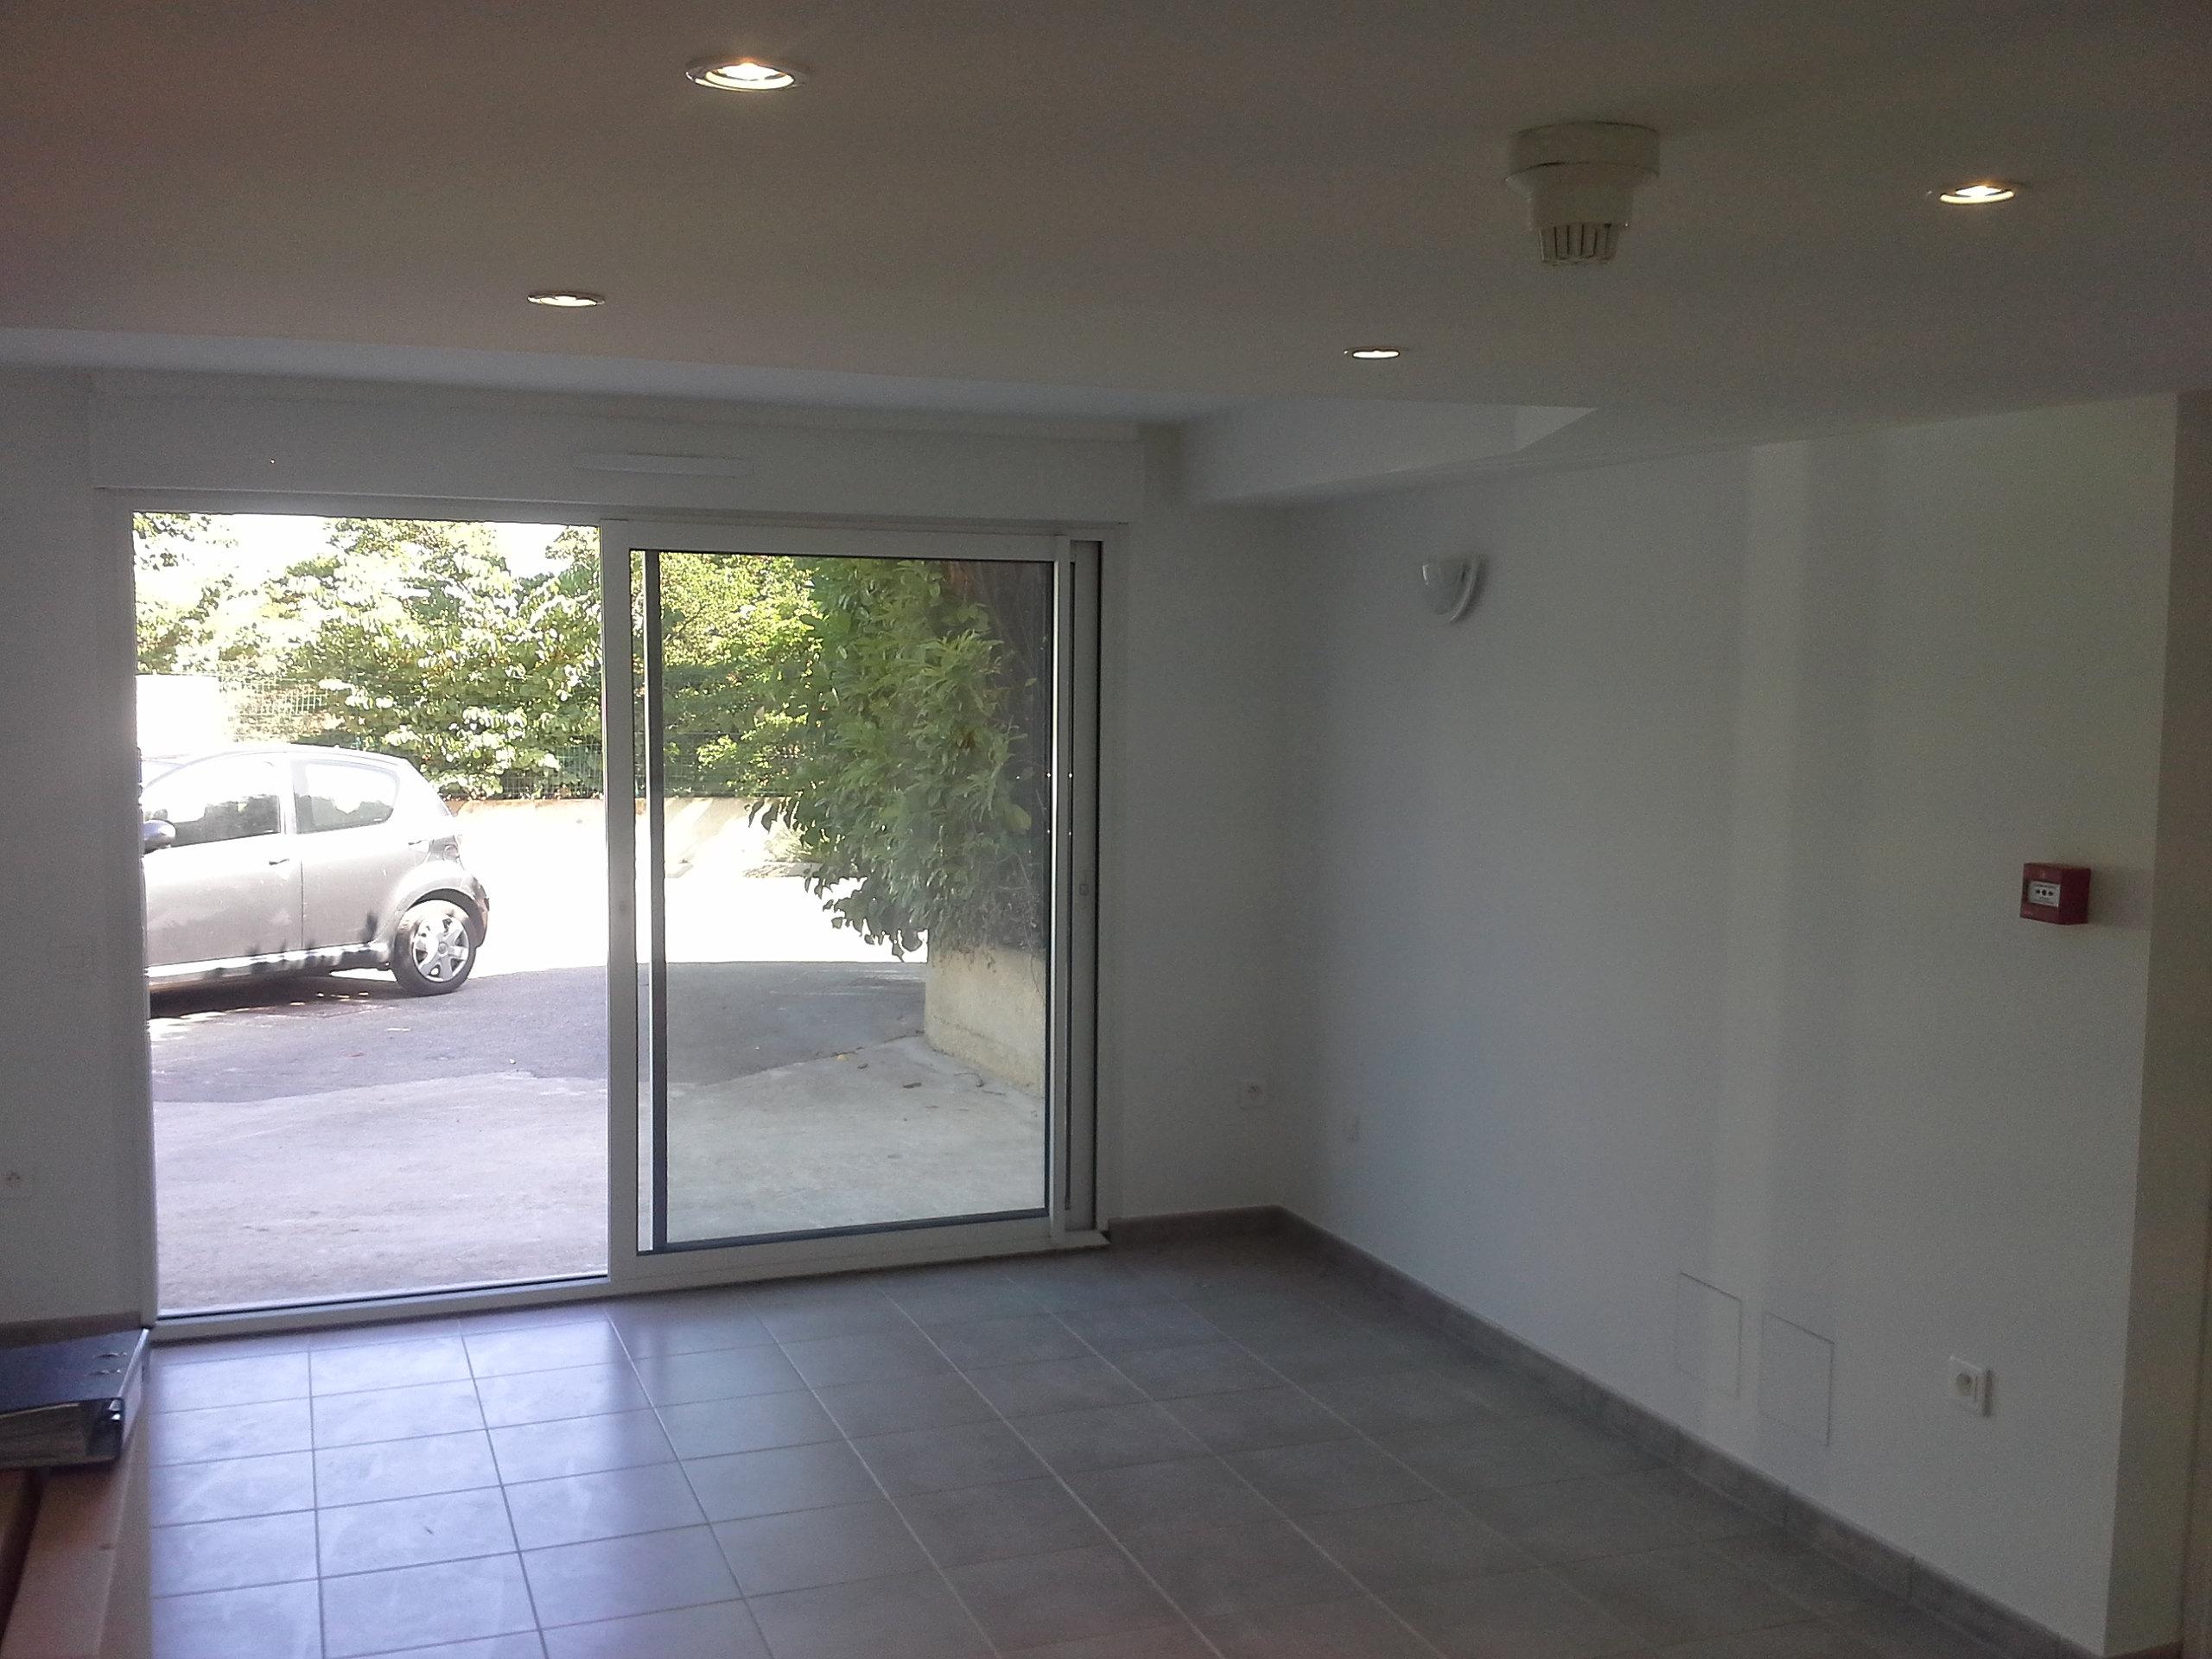 amnager un garage en chambre mission possible transformer un garage en chambre damis le garage. Black Bedroom Furniture Sets. Home Design Ideas